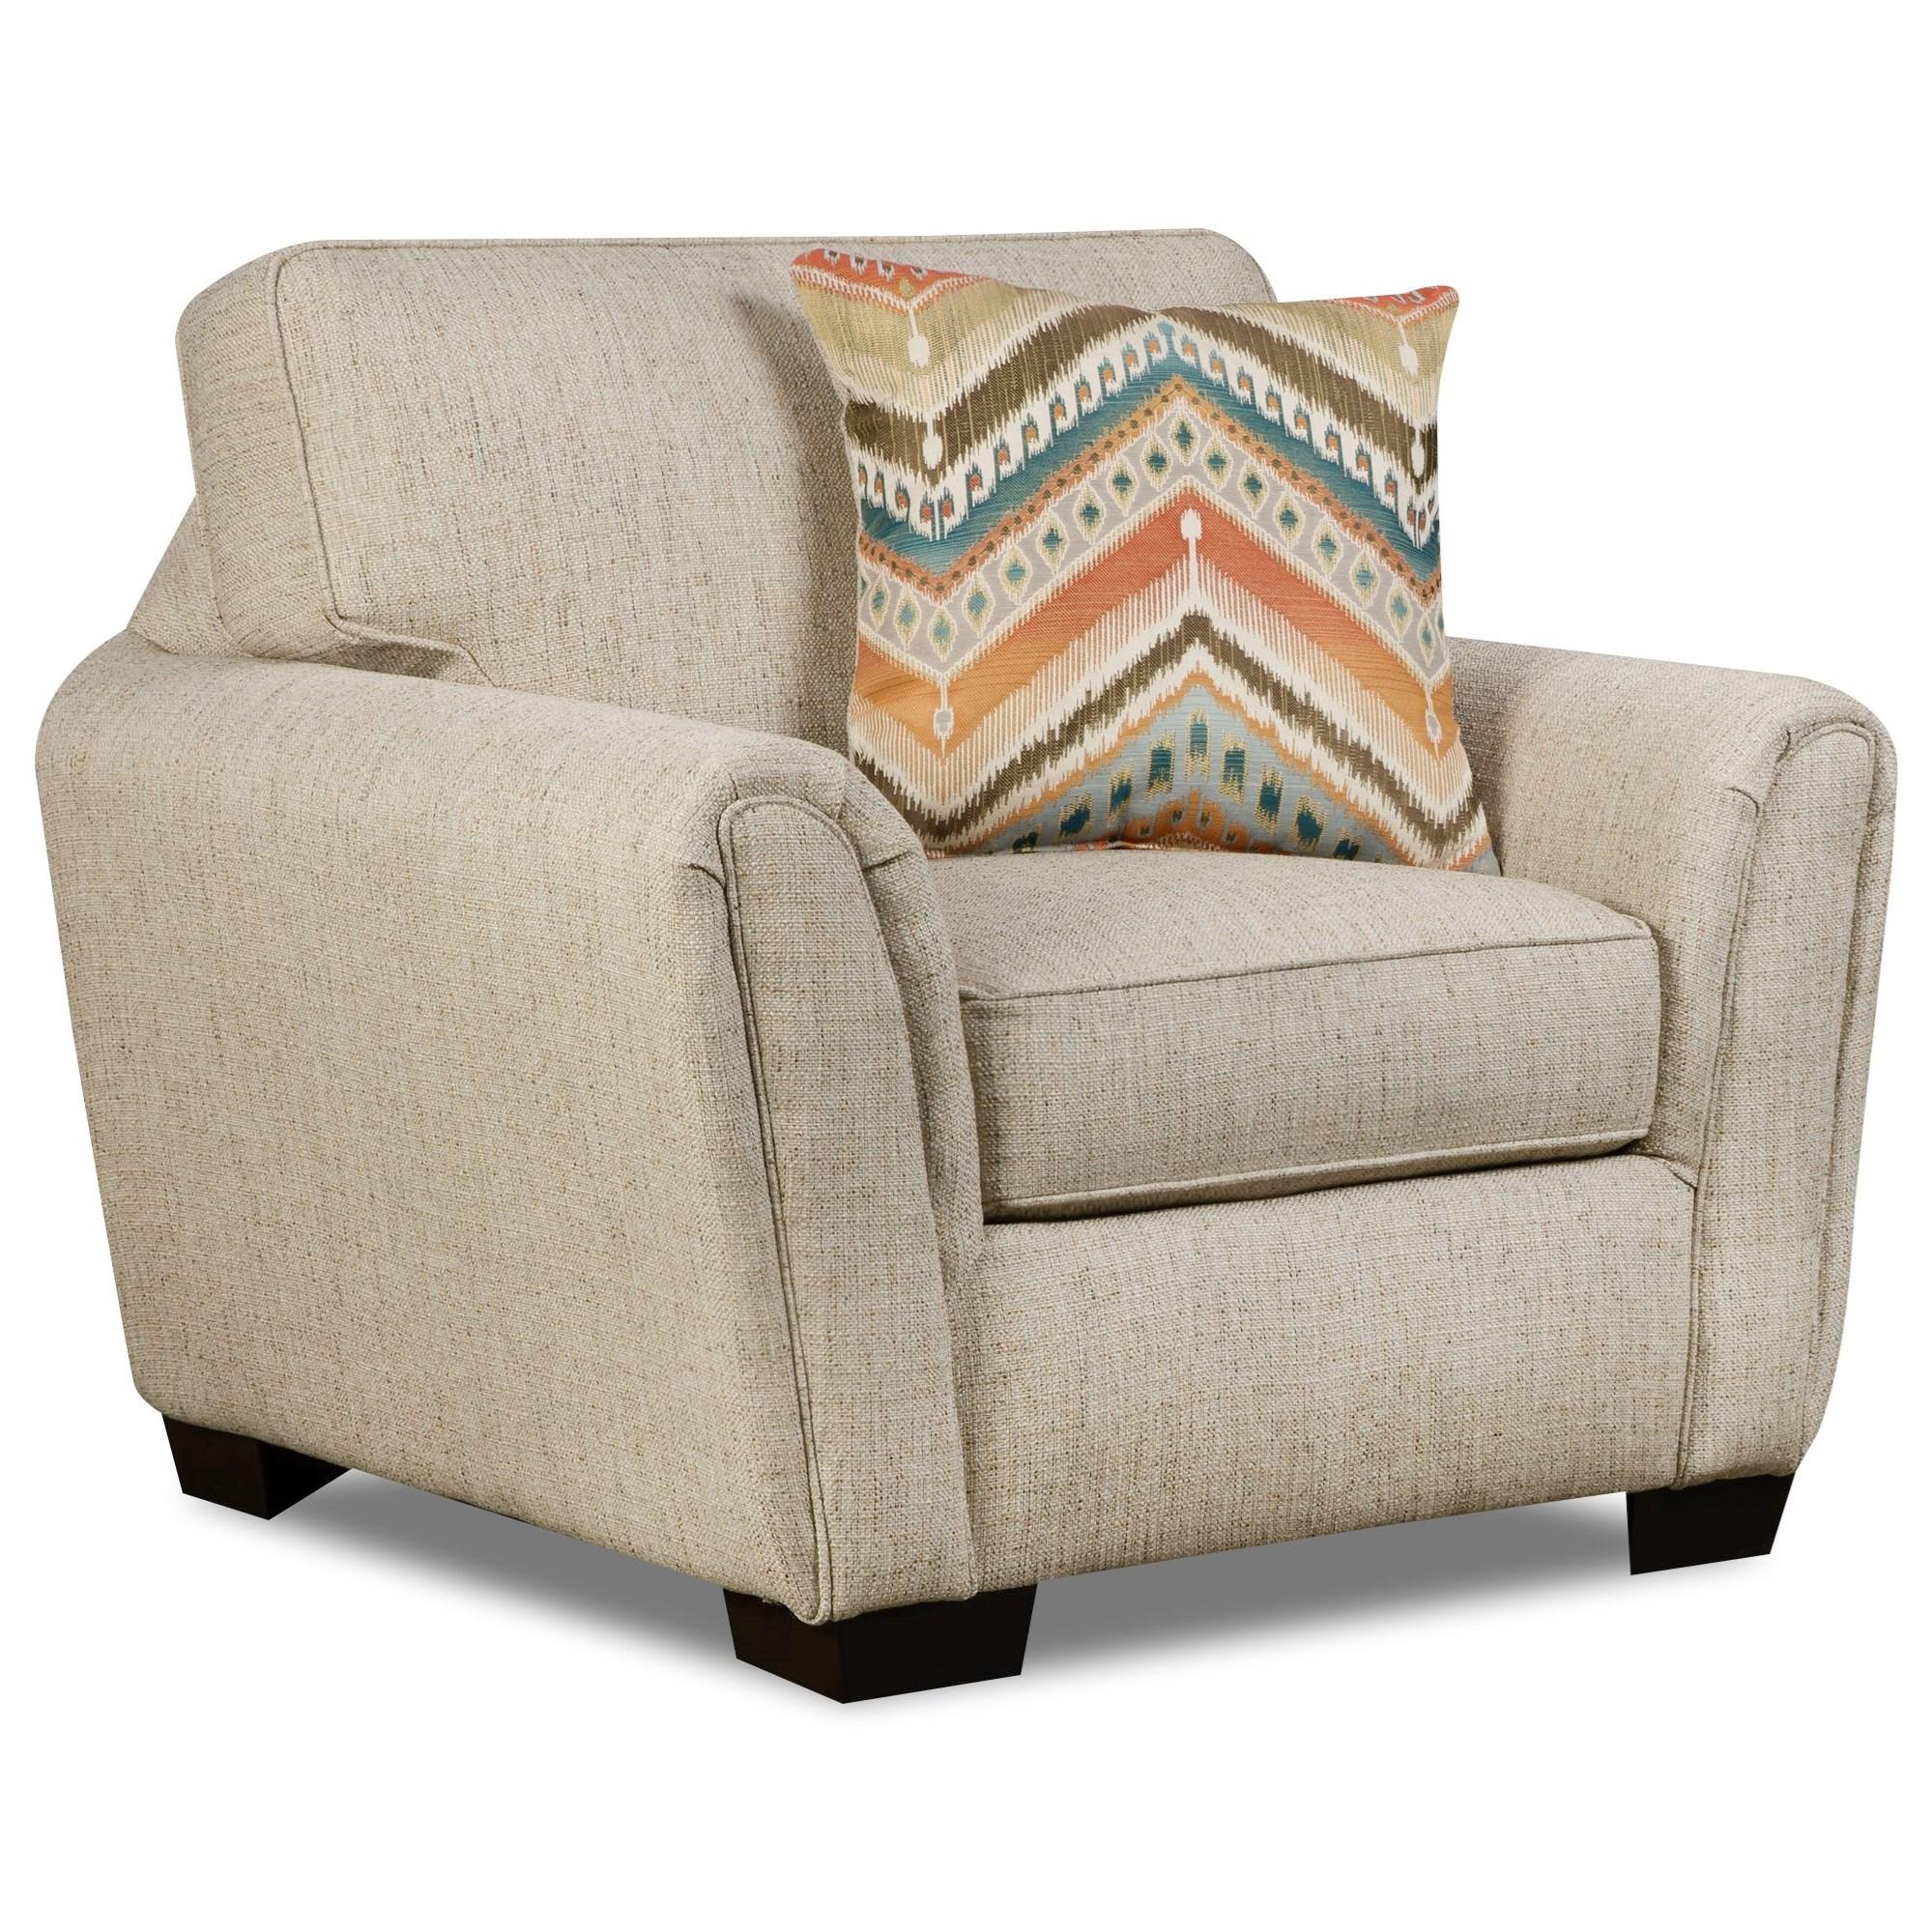 Corinthian Desiree Chair - Item Number: 7351-Desiree-Canival